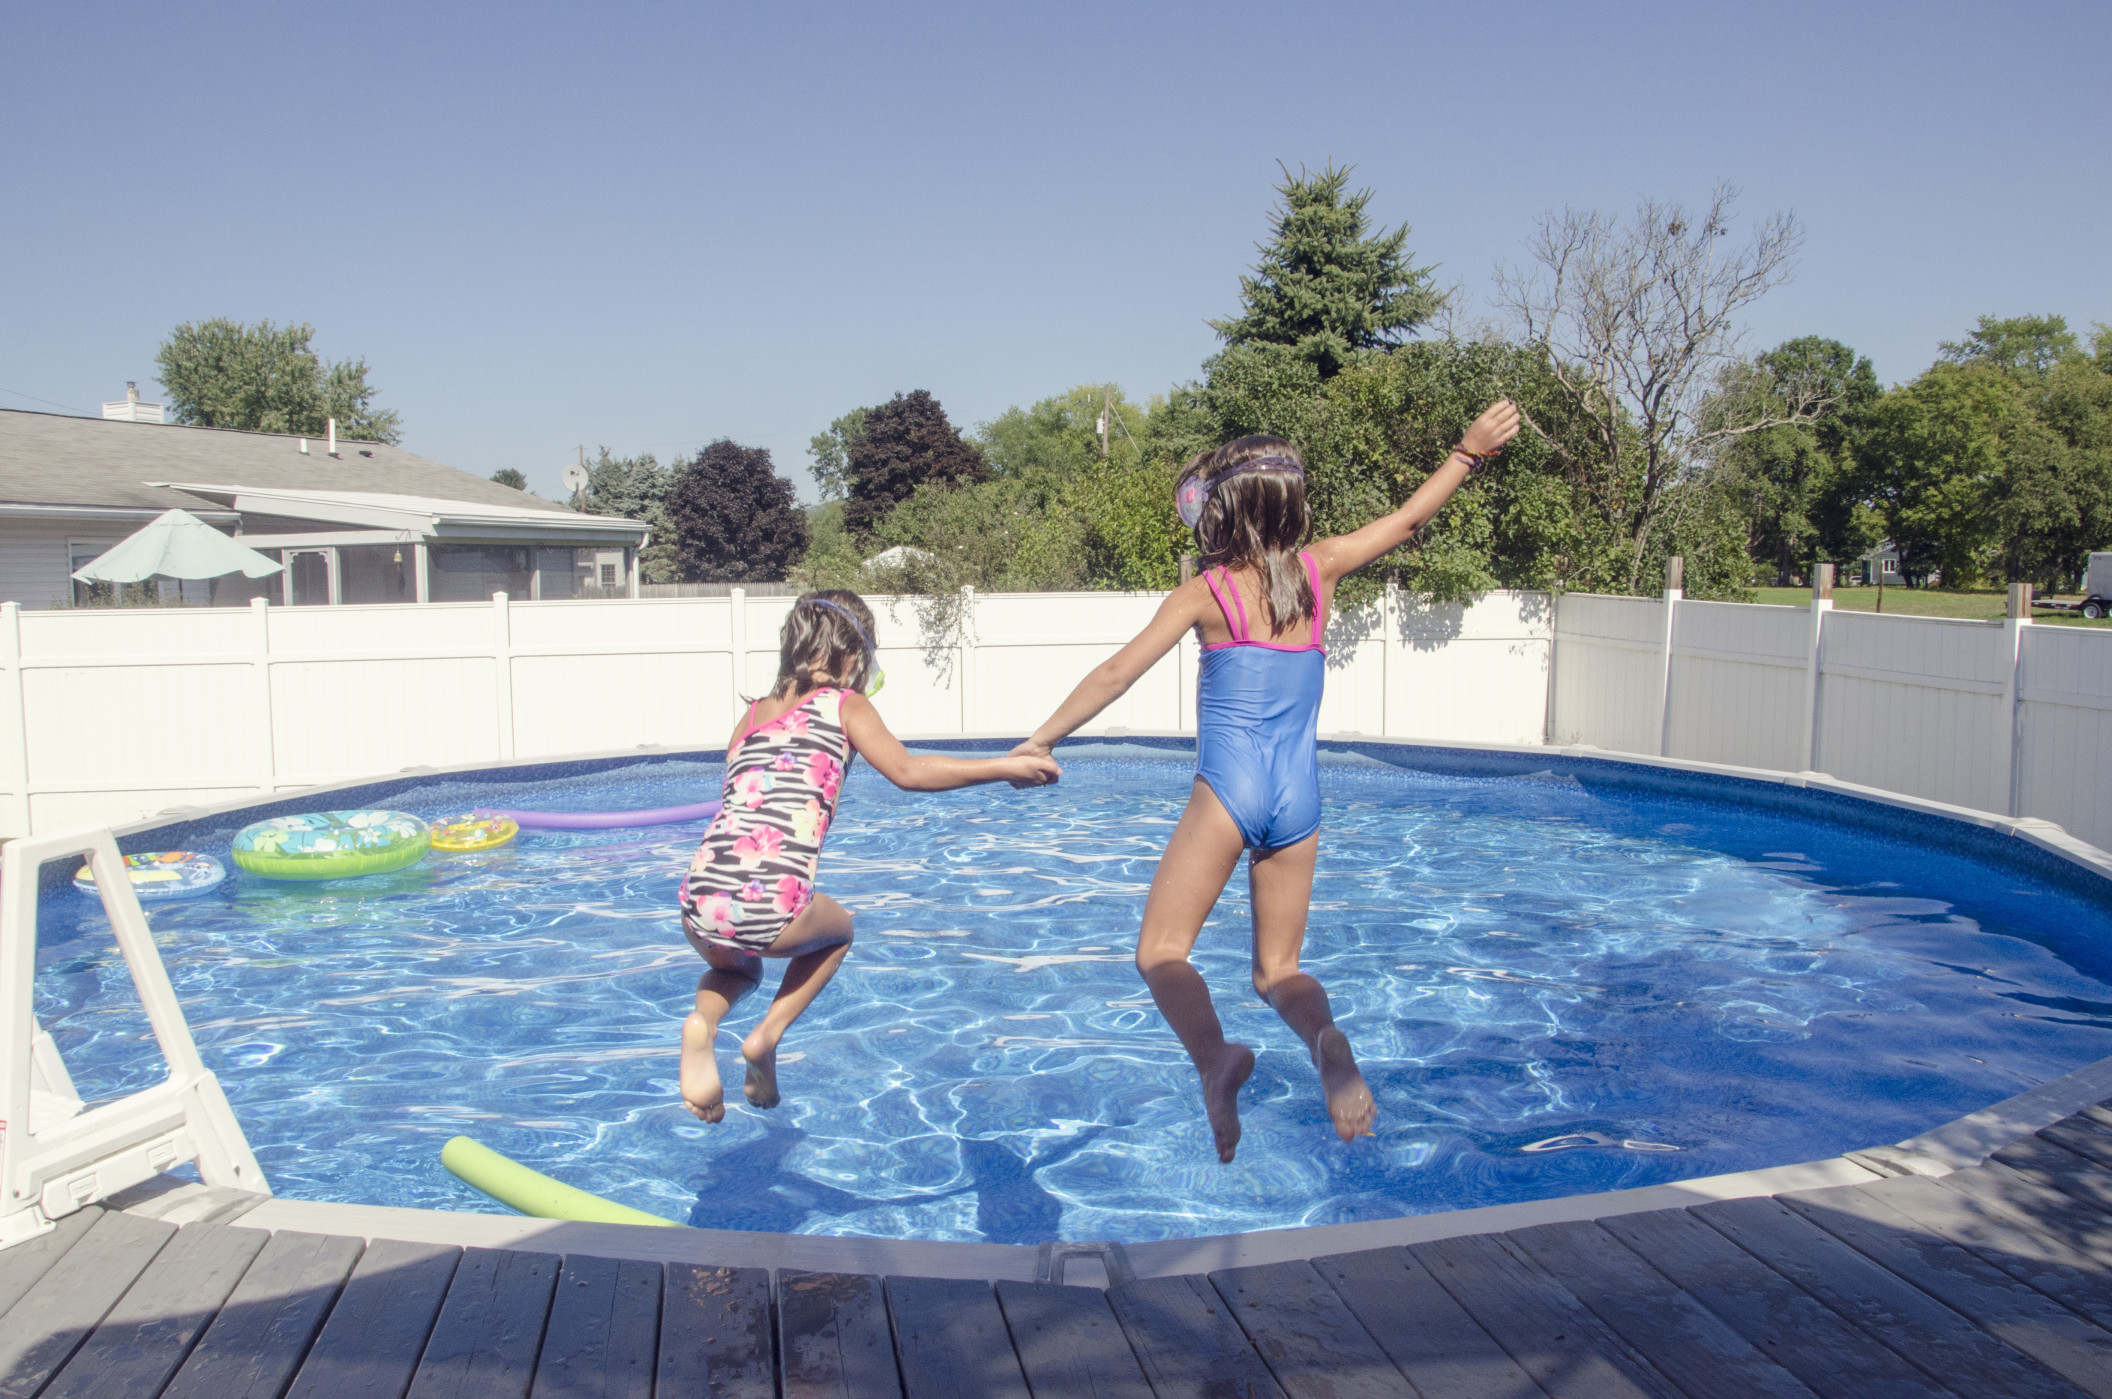 summer-pool-adventures_t20_knP6Qp